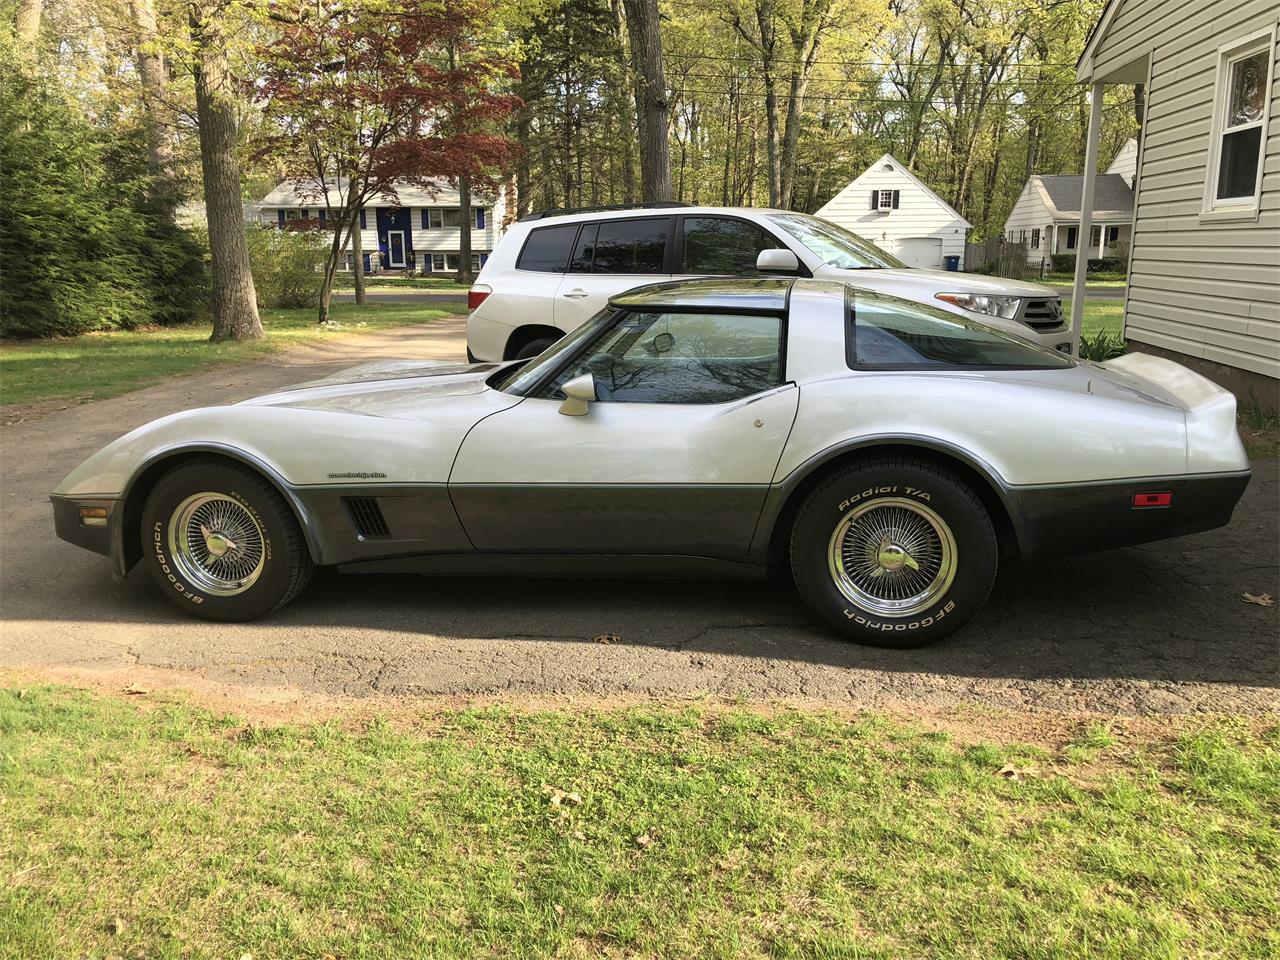 1982 Chevrolet Corvette (CC-1251942) for sale in Vernon, Connecticut